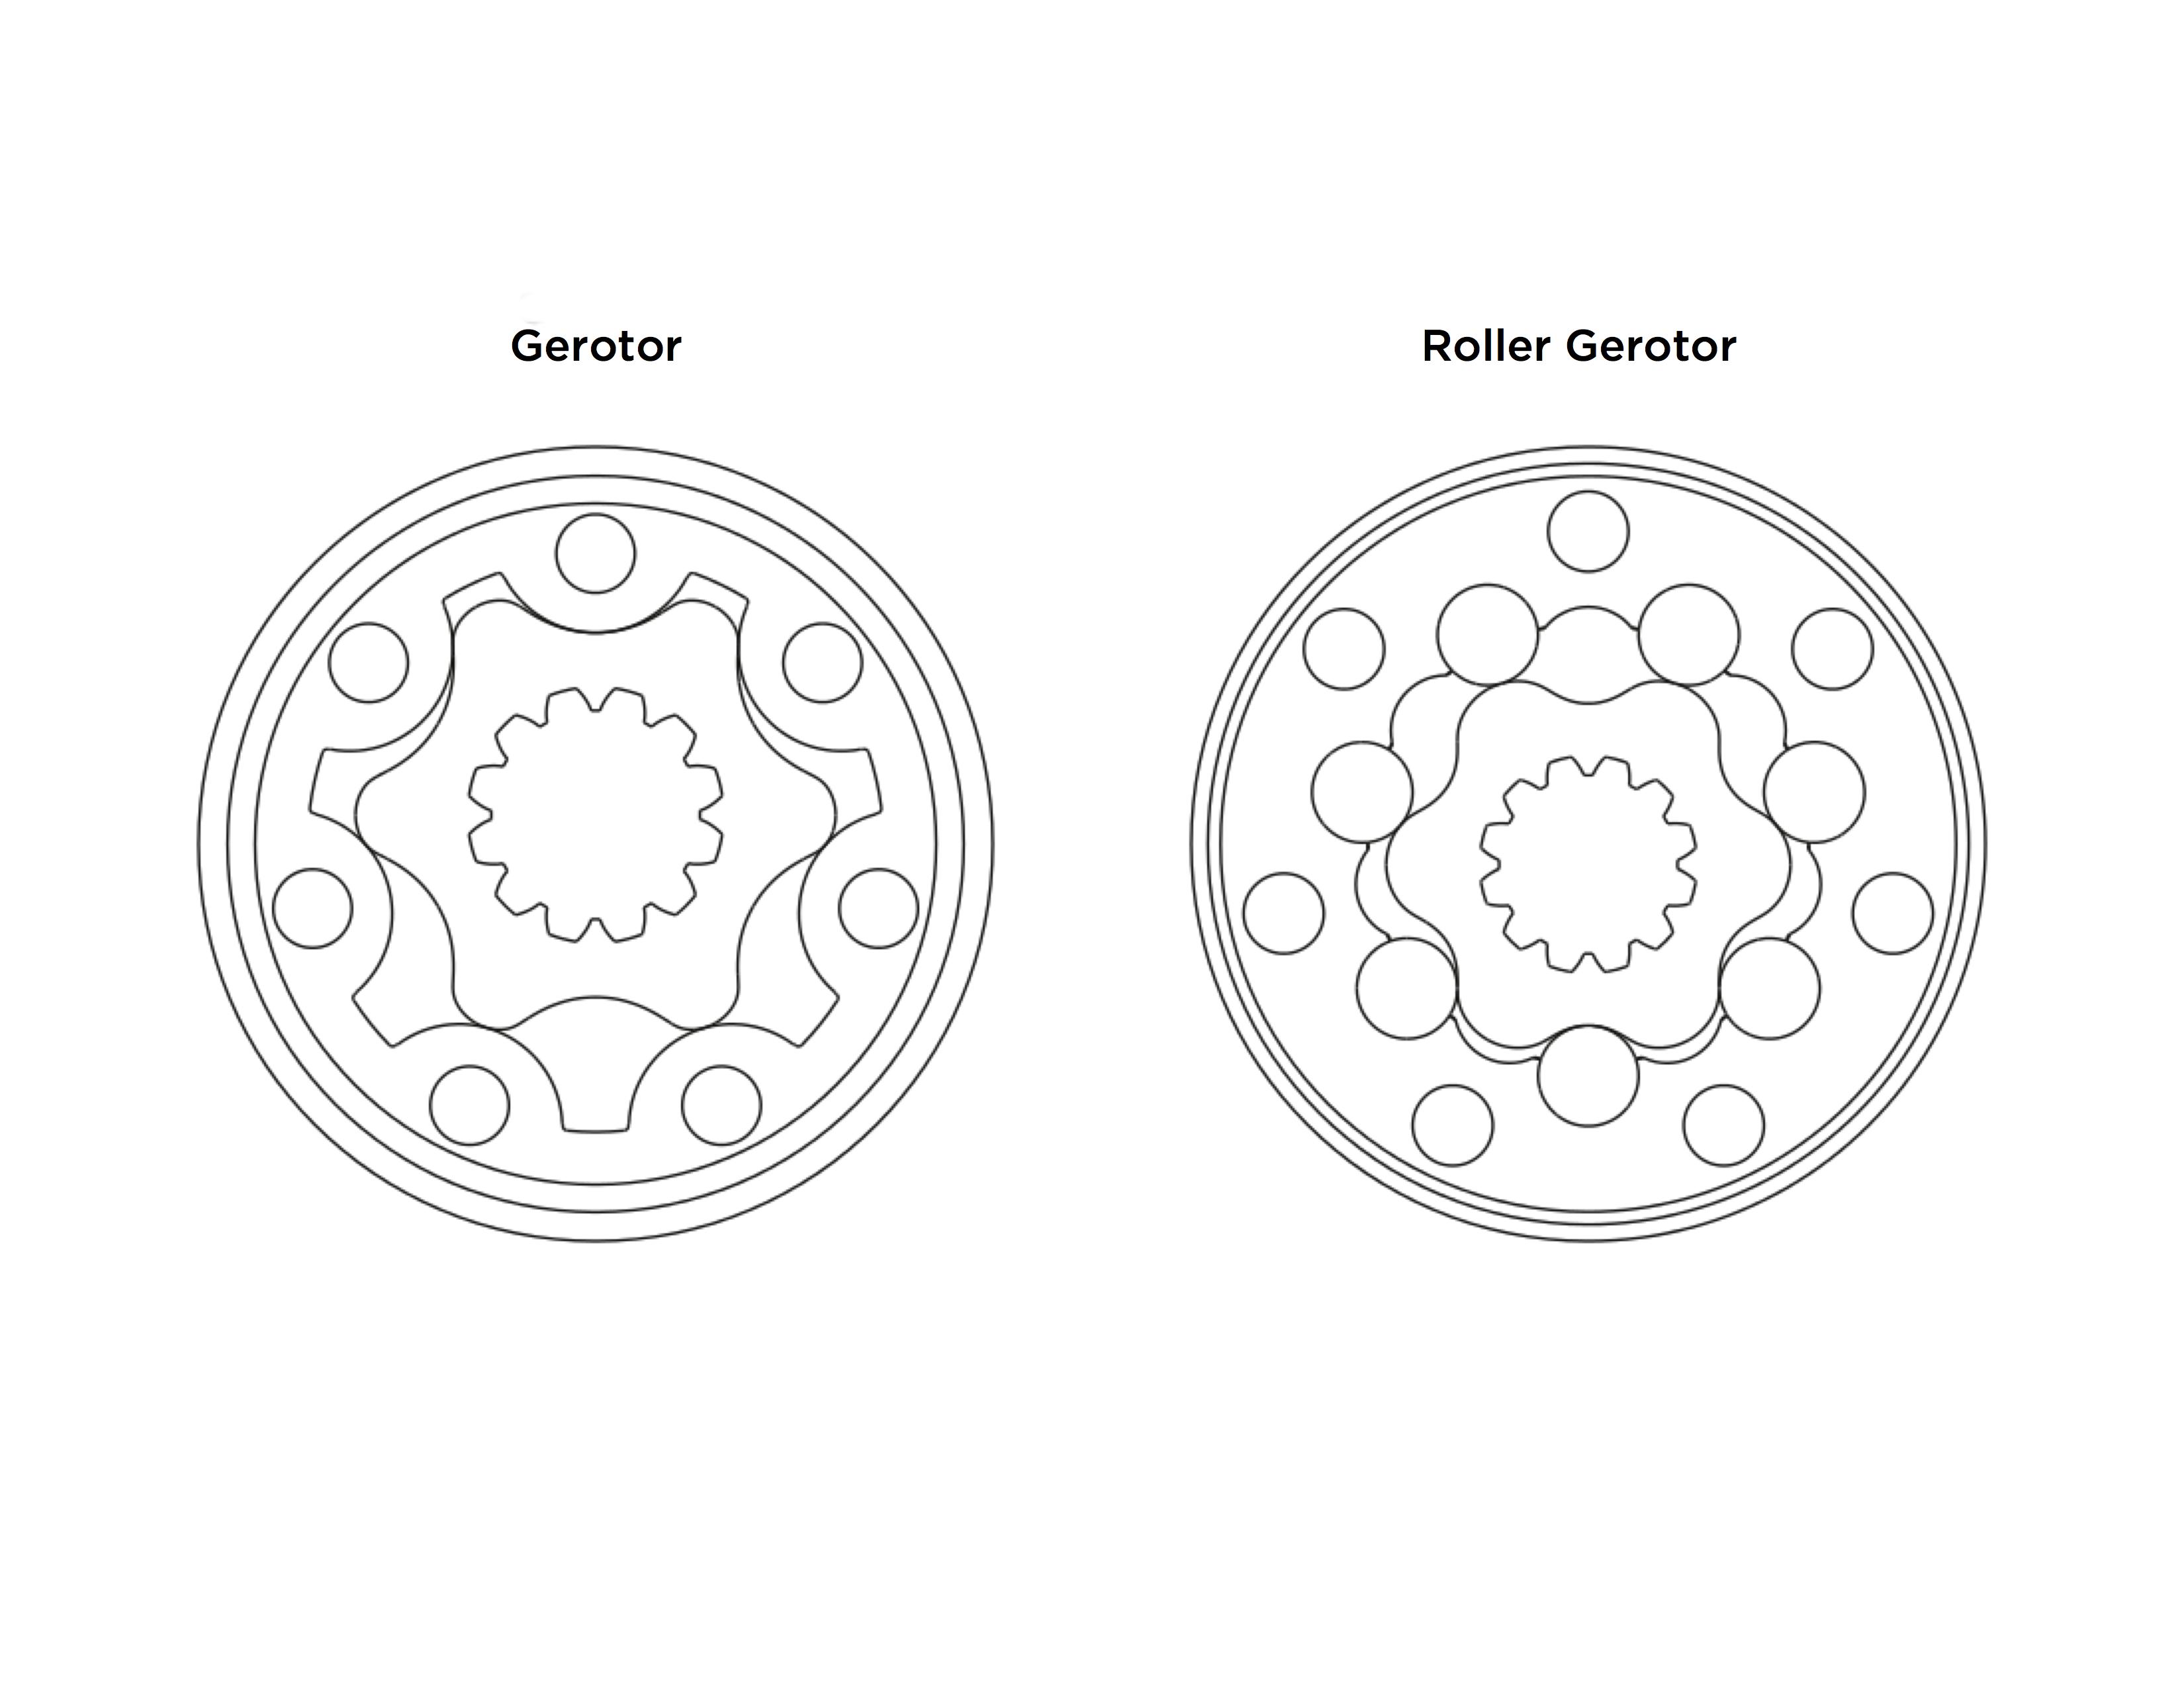 gerotor hydraulic motor animation